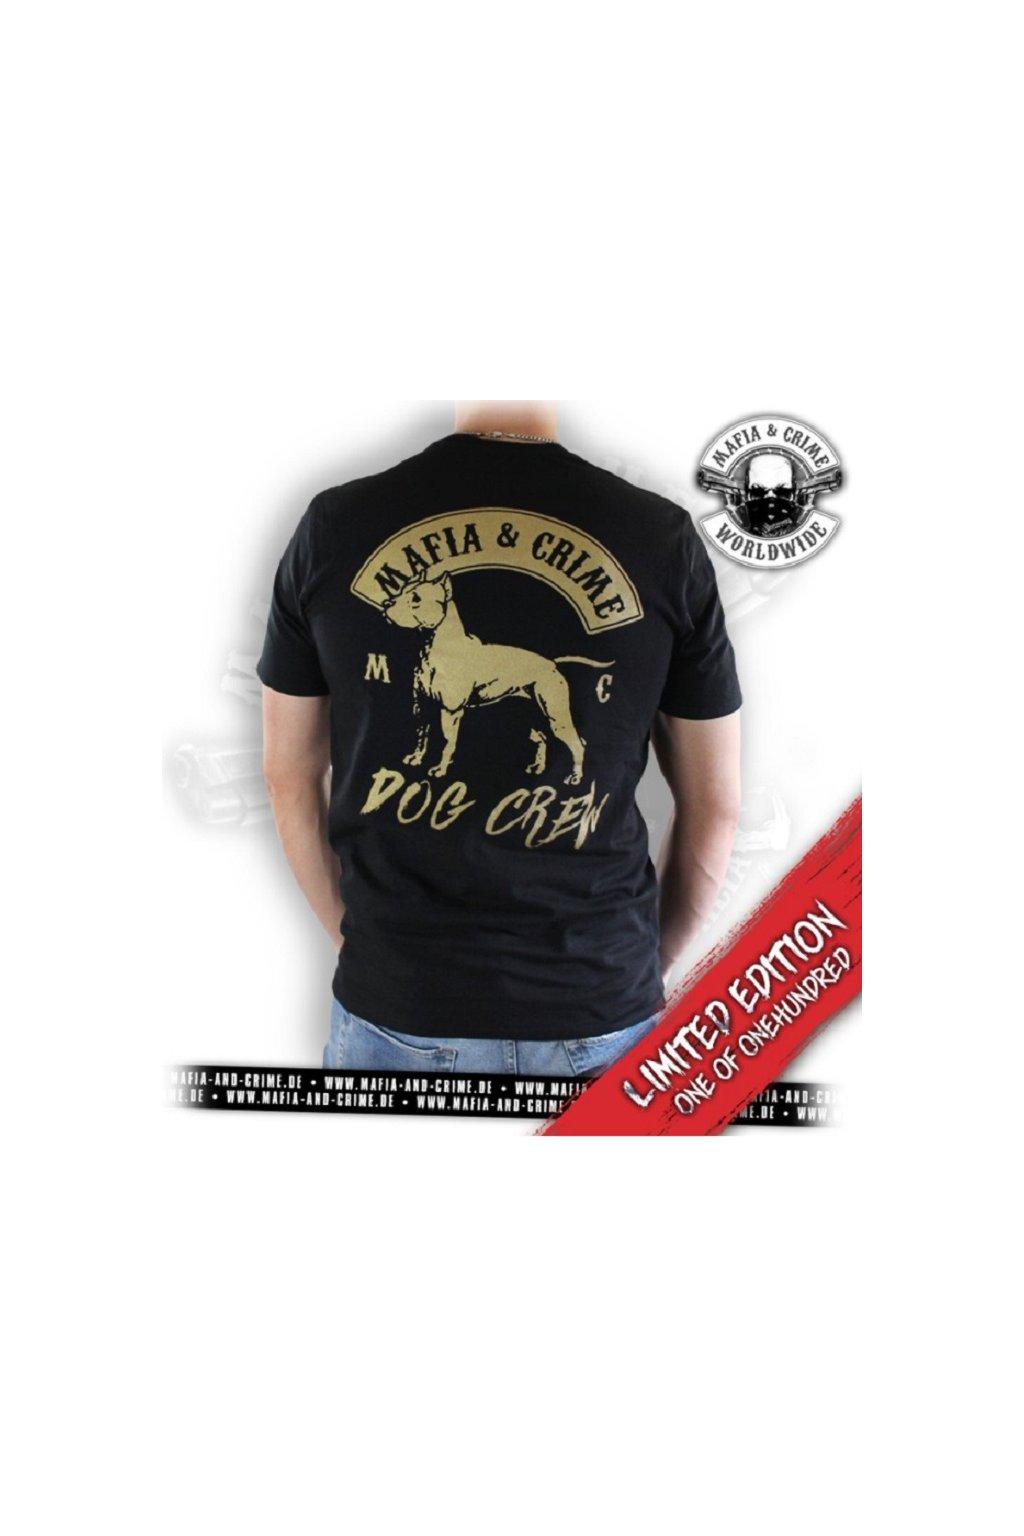 Mafia & Crime pánské triko Crew Dog Limitovaná edice! obr1